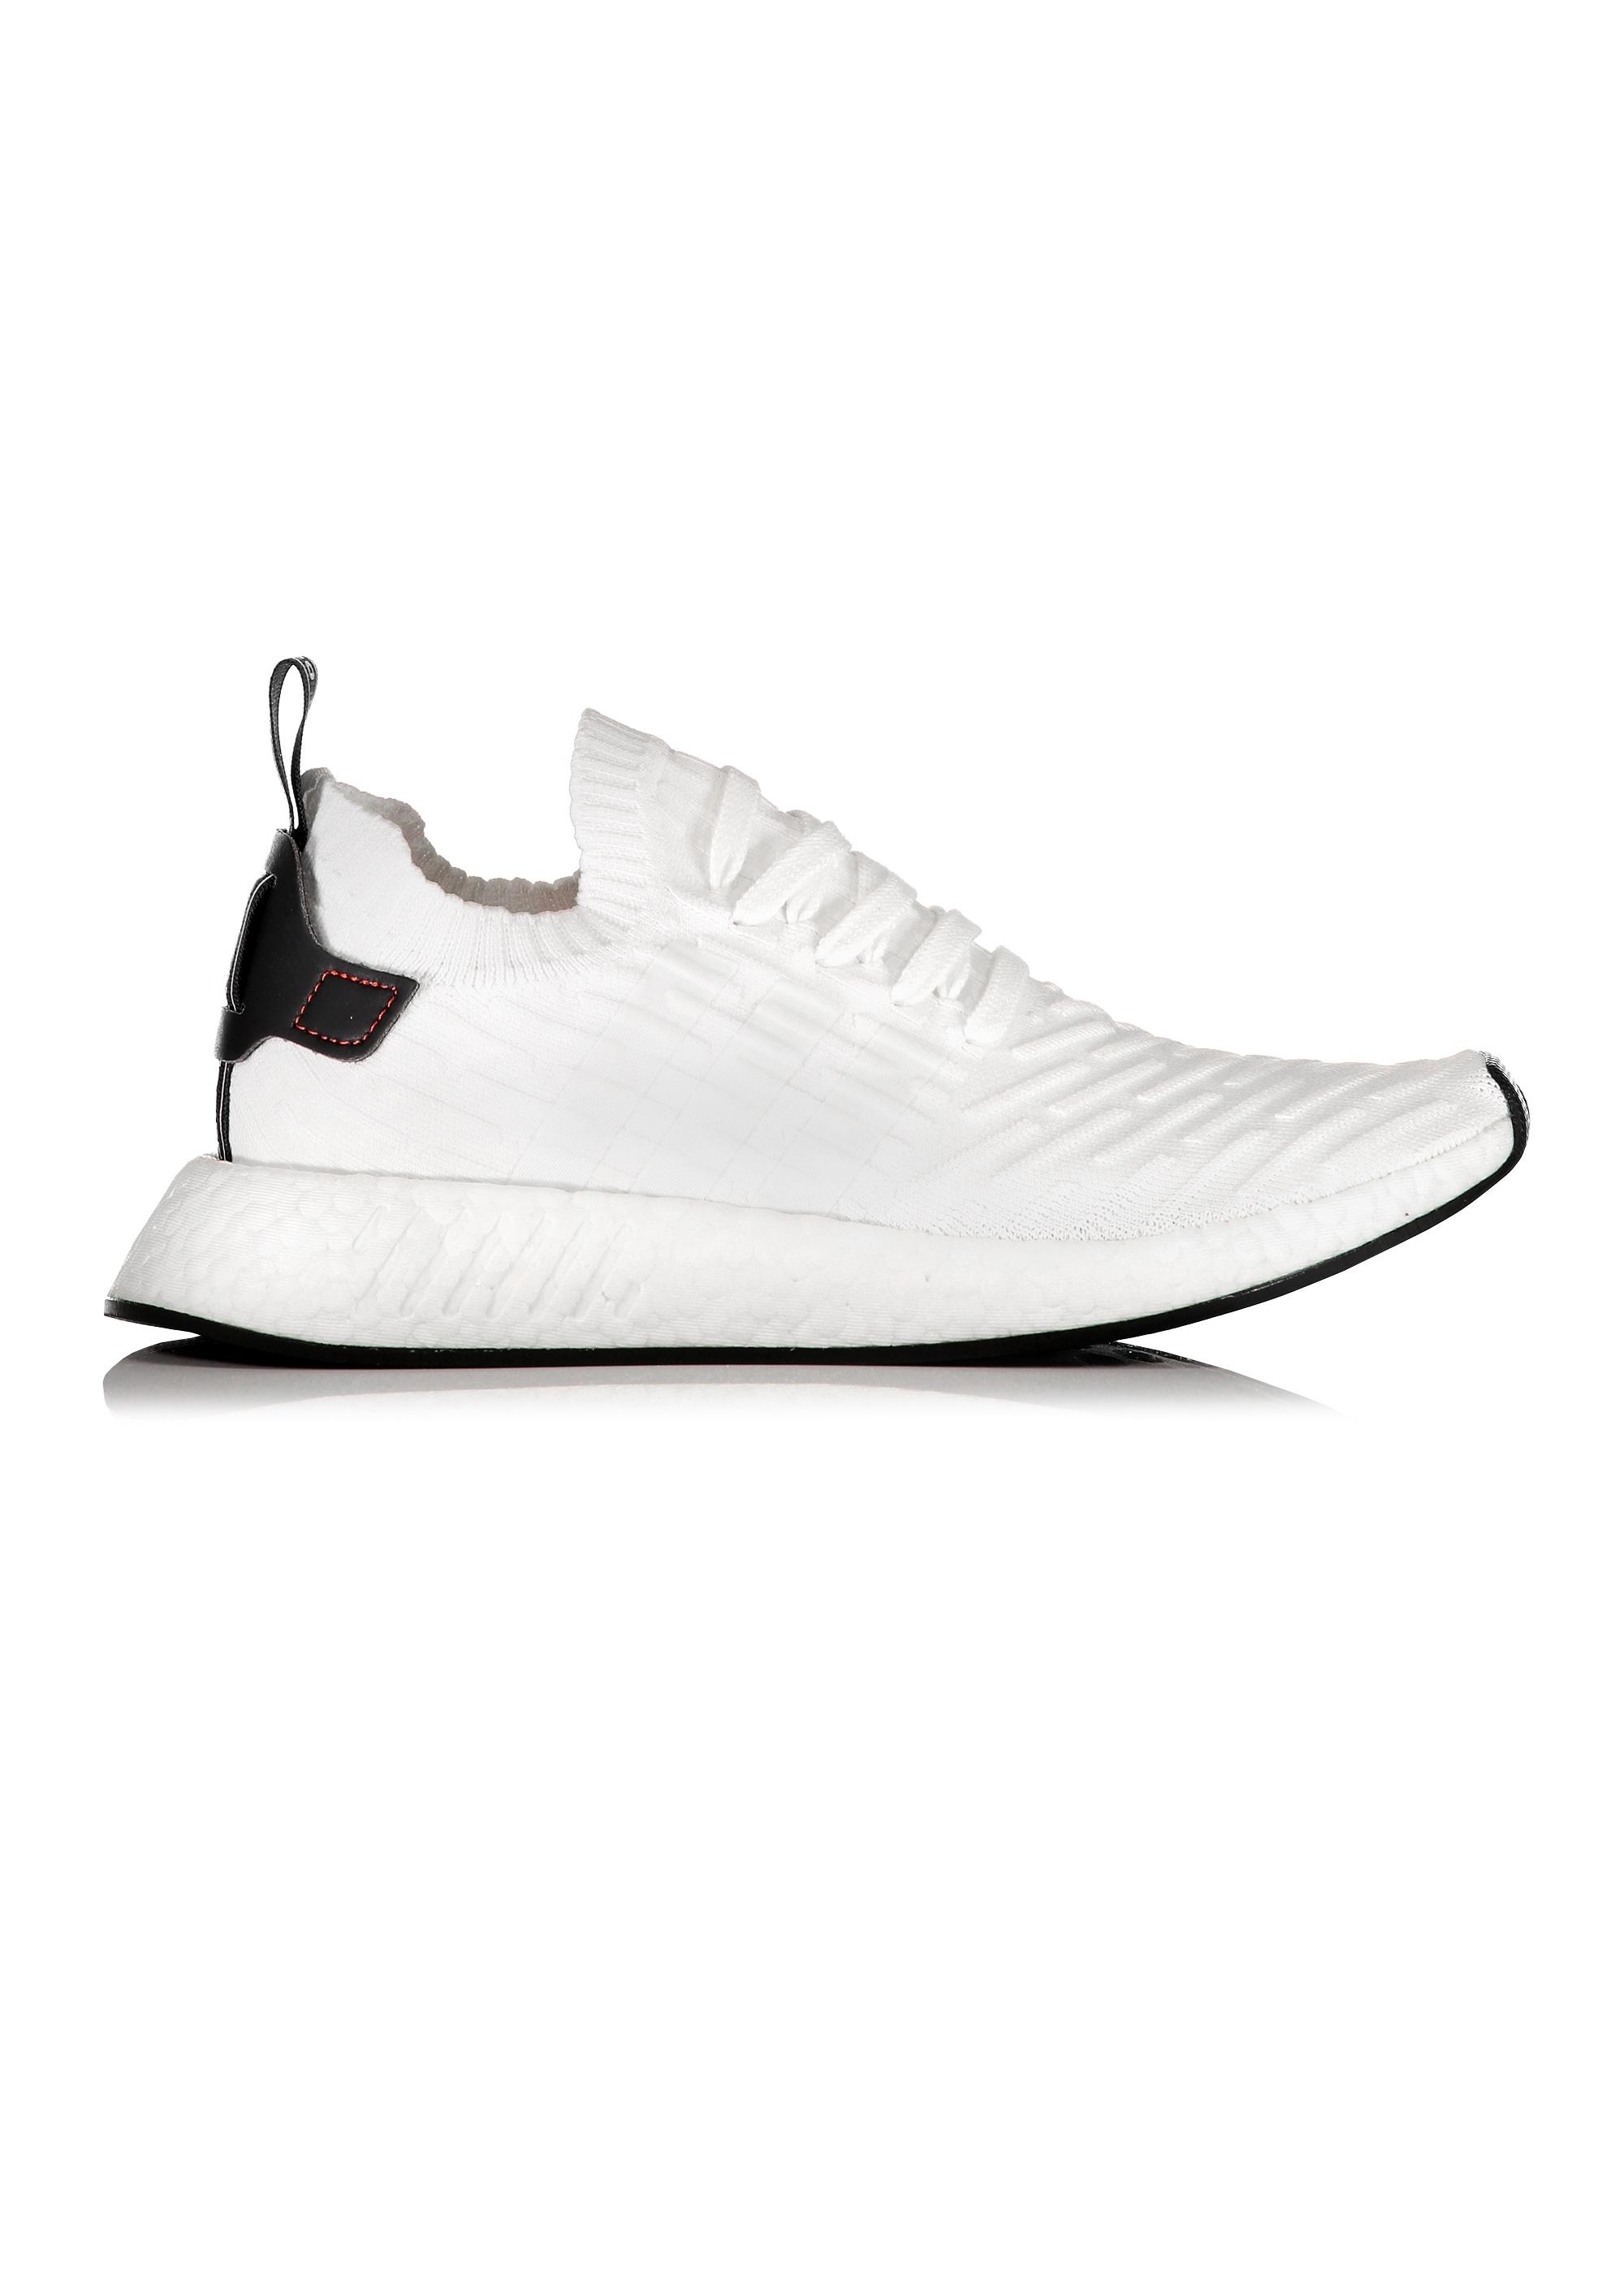 2000x2798 Adidas Originals Footwear Nmd R2 Pk